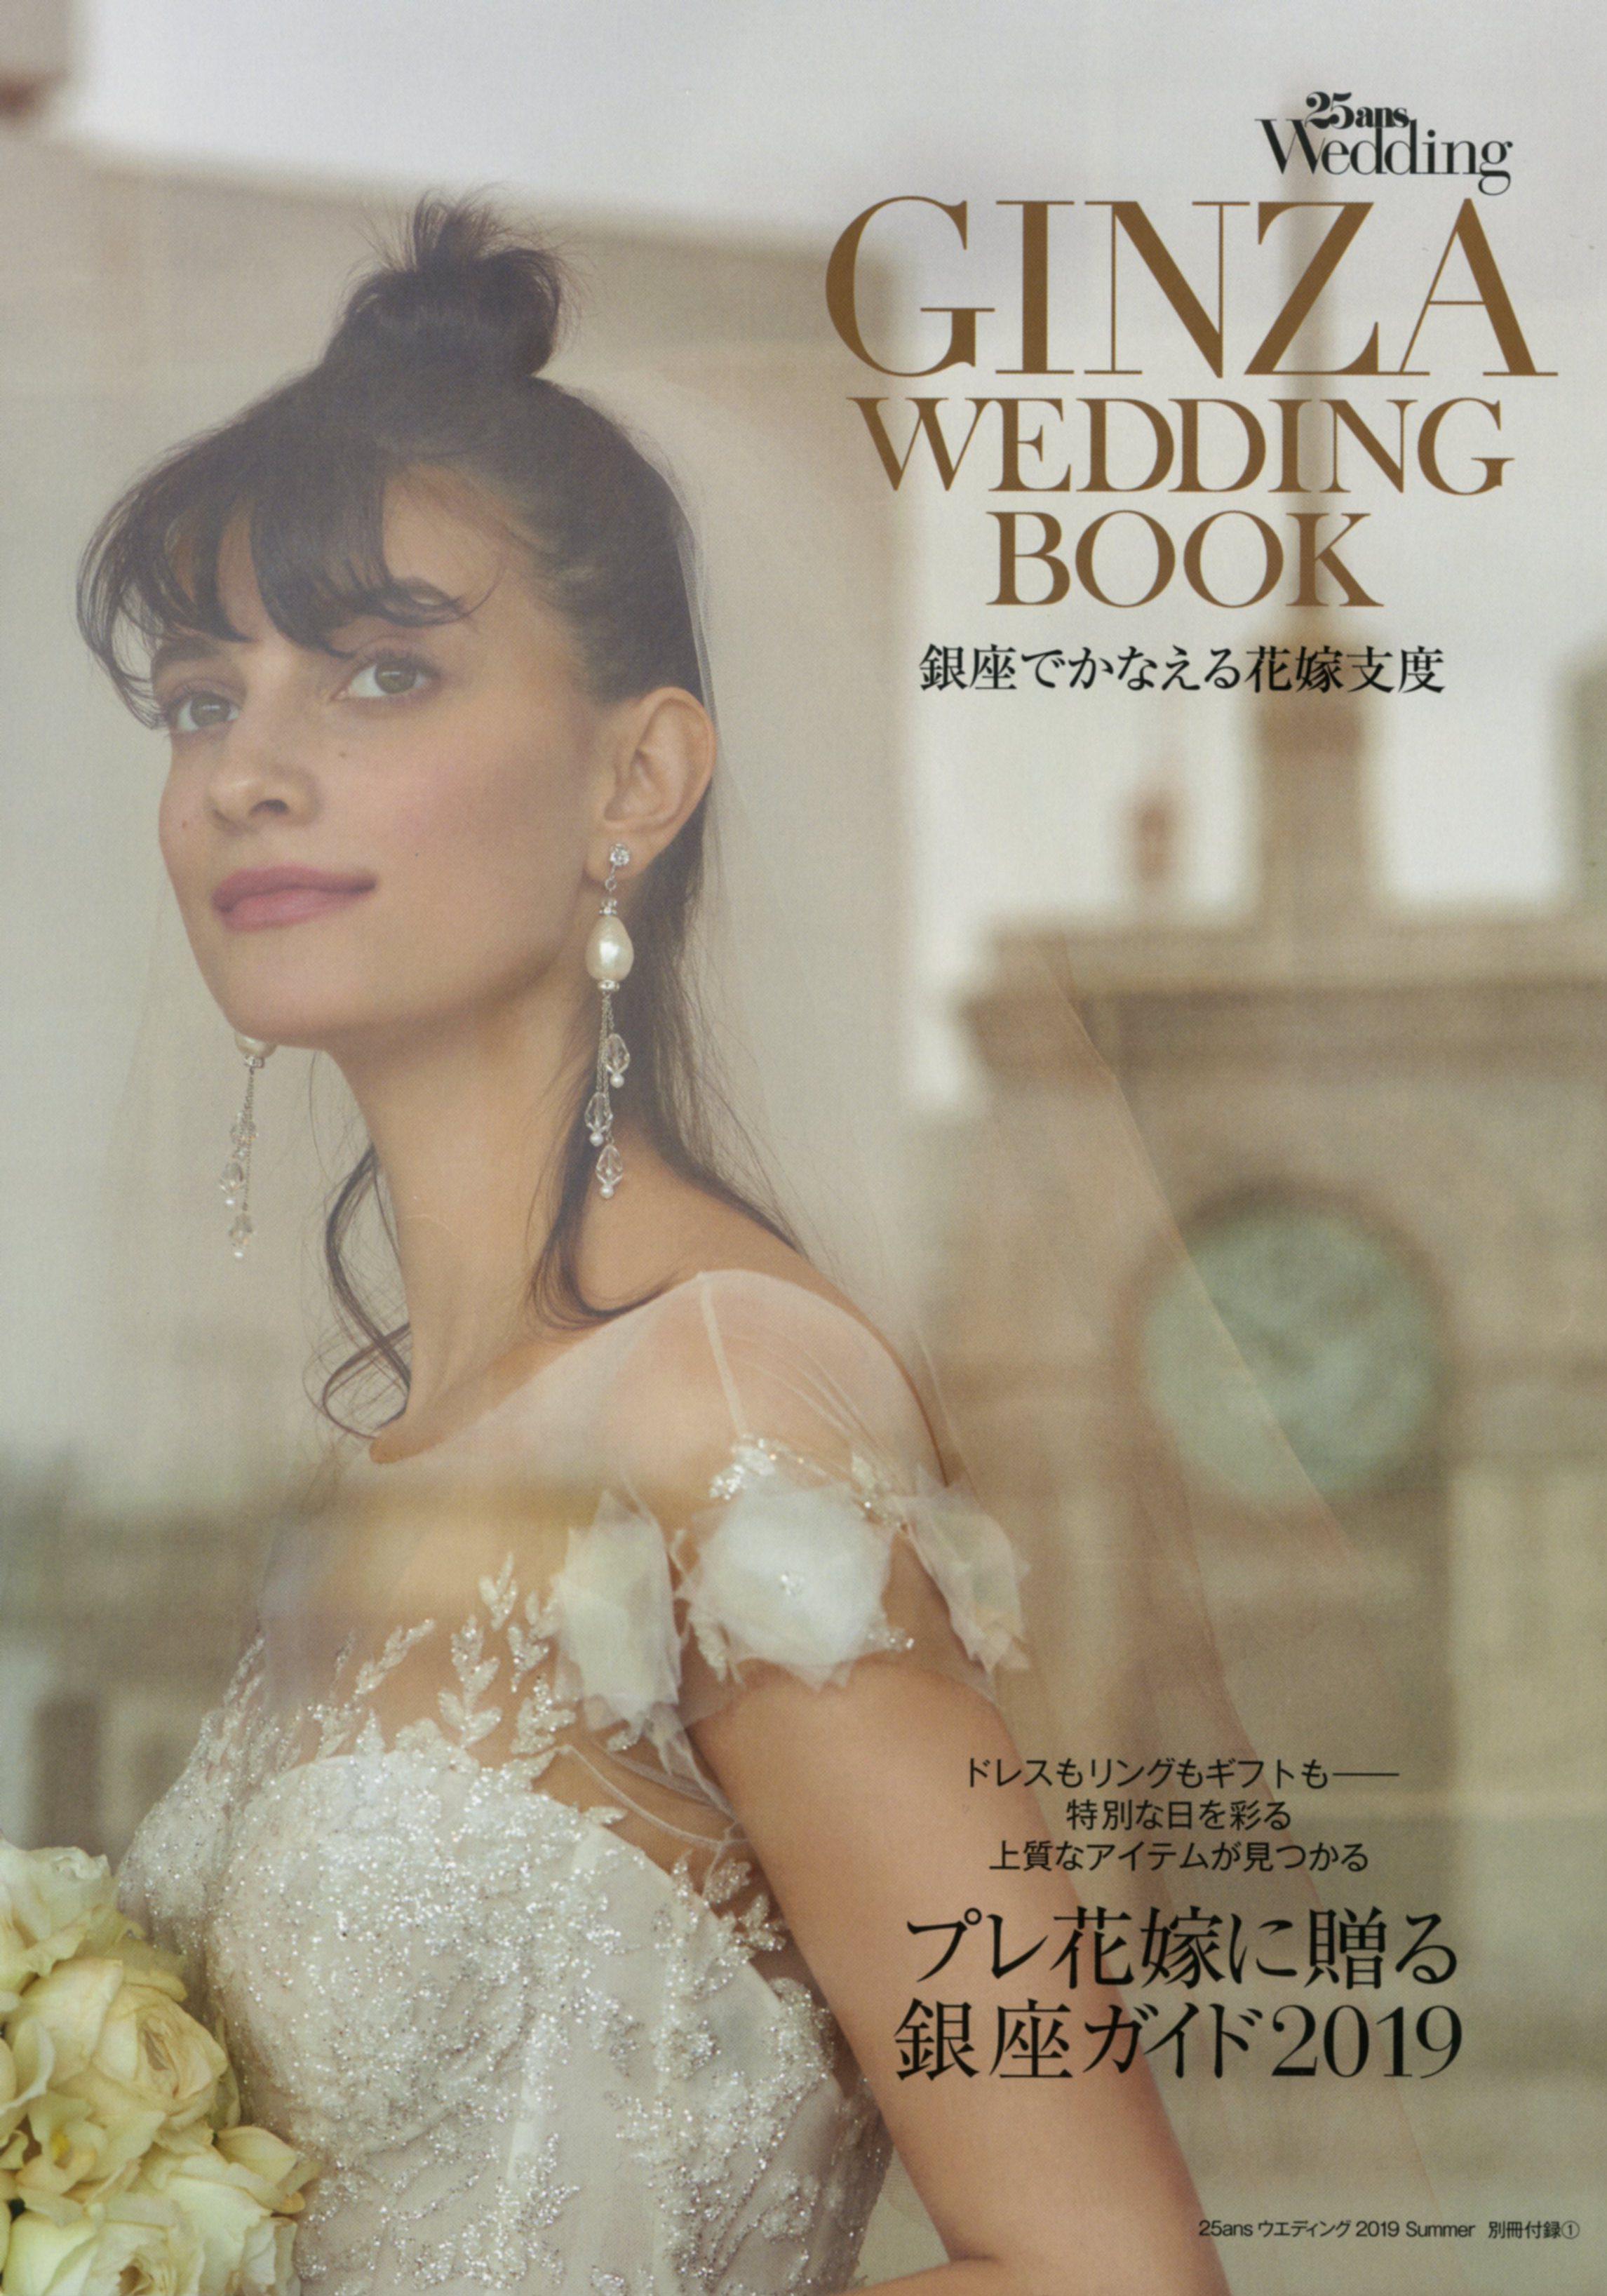 6月7日発売_25ans Wedding 2019 Summer 【別冊付録1:GINZA WEDDING BOOK】 表紙